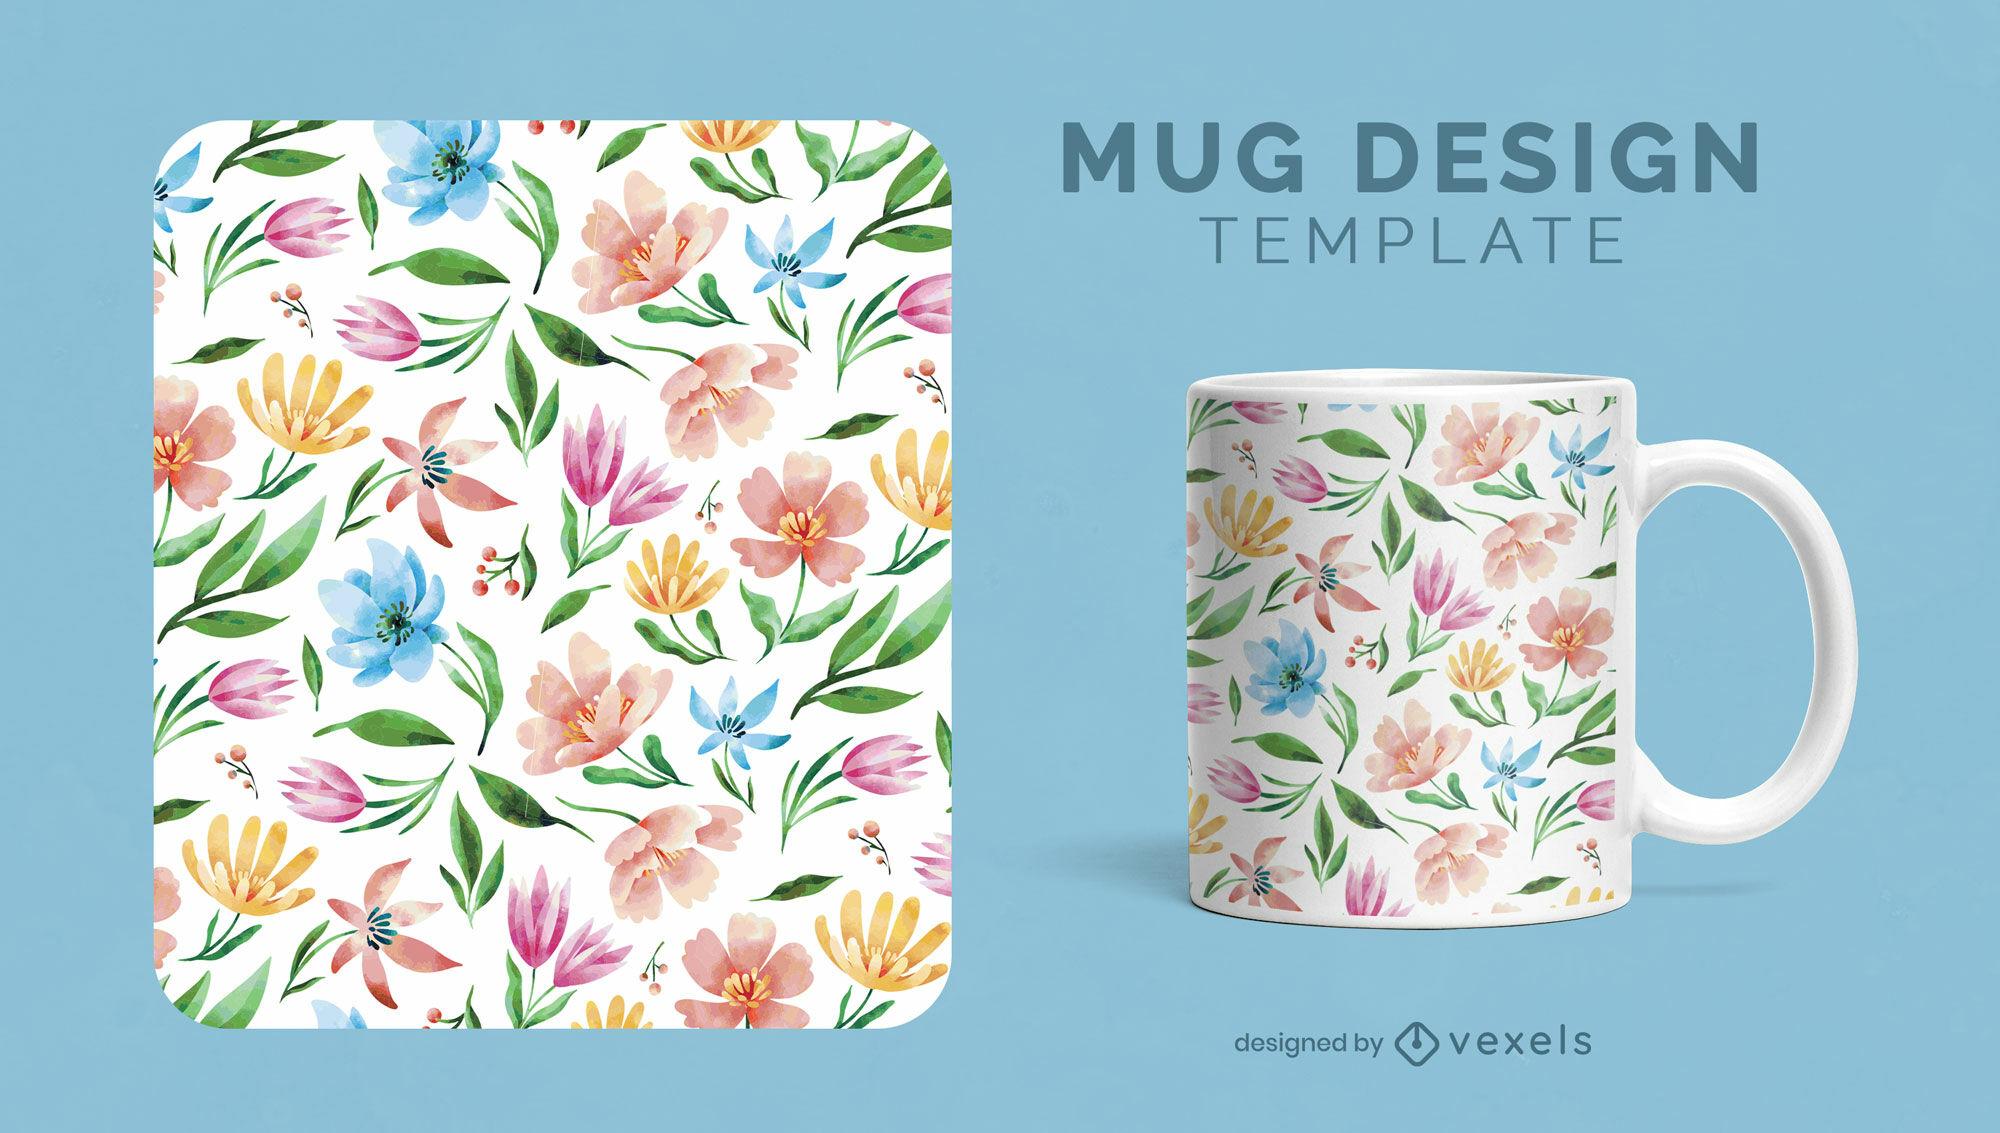 Flowers and plants watercolor mug design